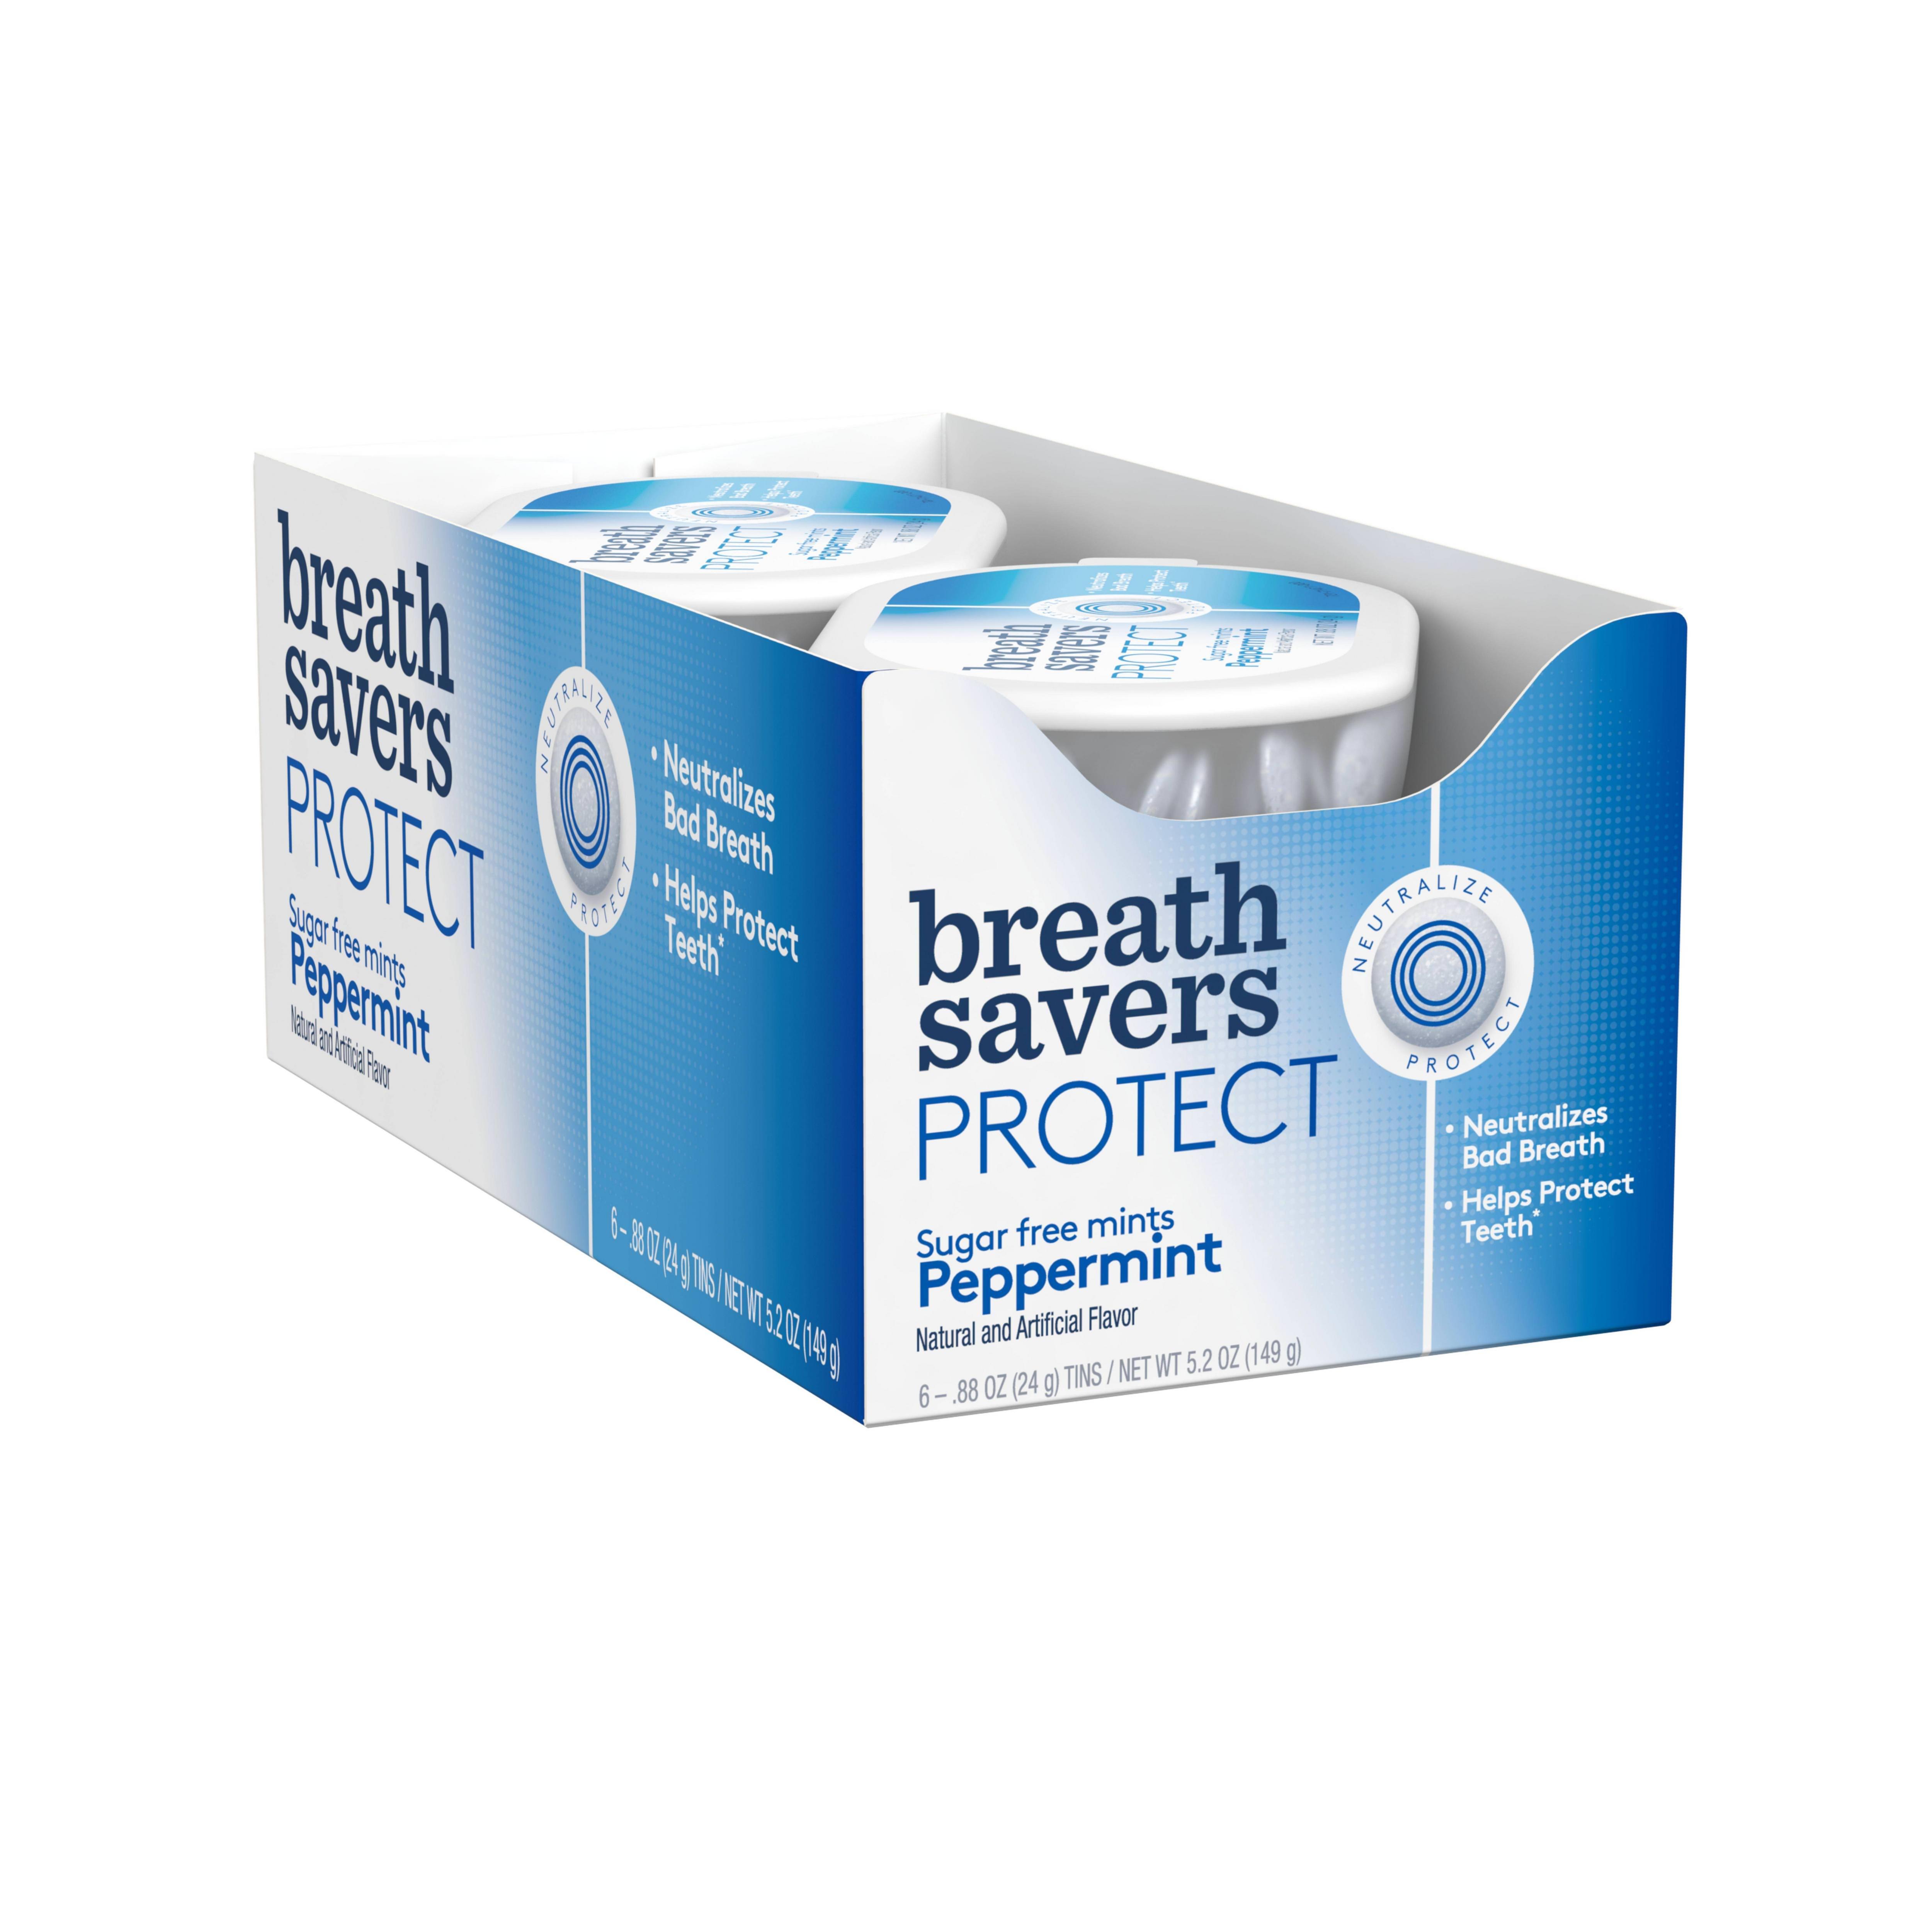 Breath Savers, Protect Peppermint Mints, 0.88 Oz, 6 Ct